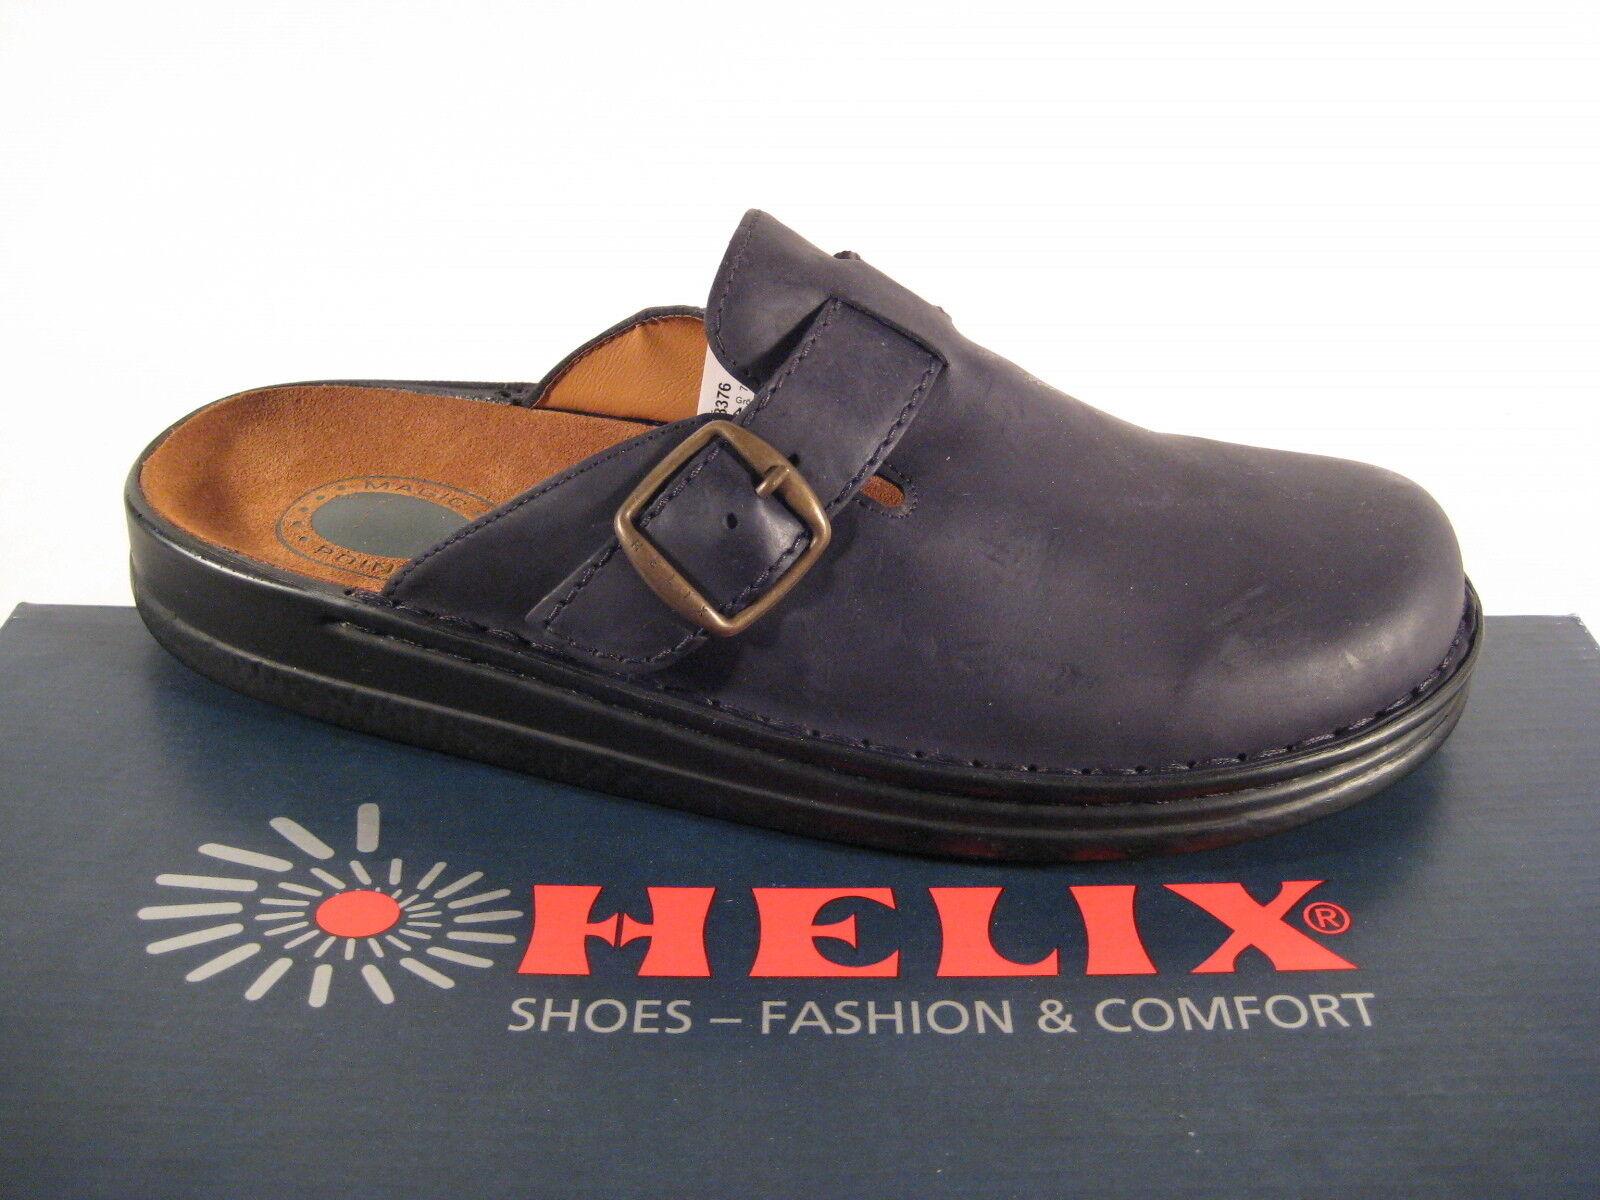 Helix Clogs Pantolette Pantoletten schwarz Echt Leder Luftpolster Lederfußbett